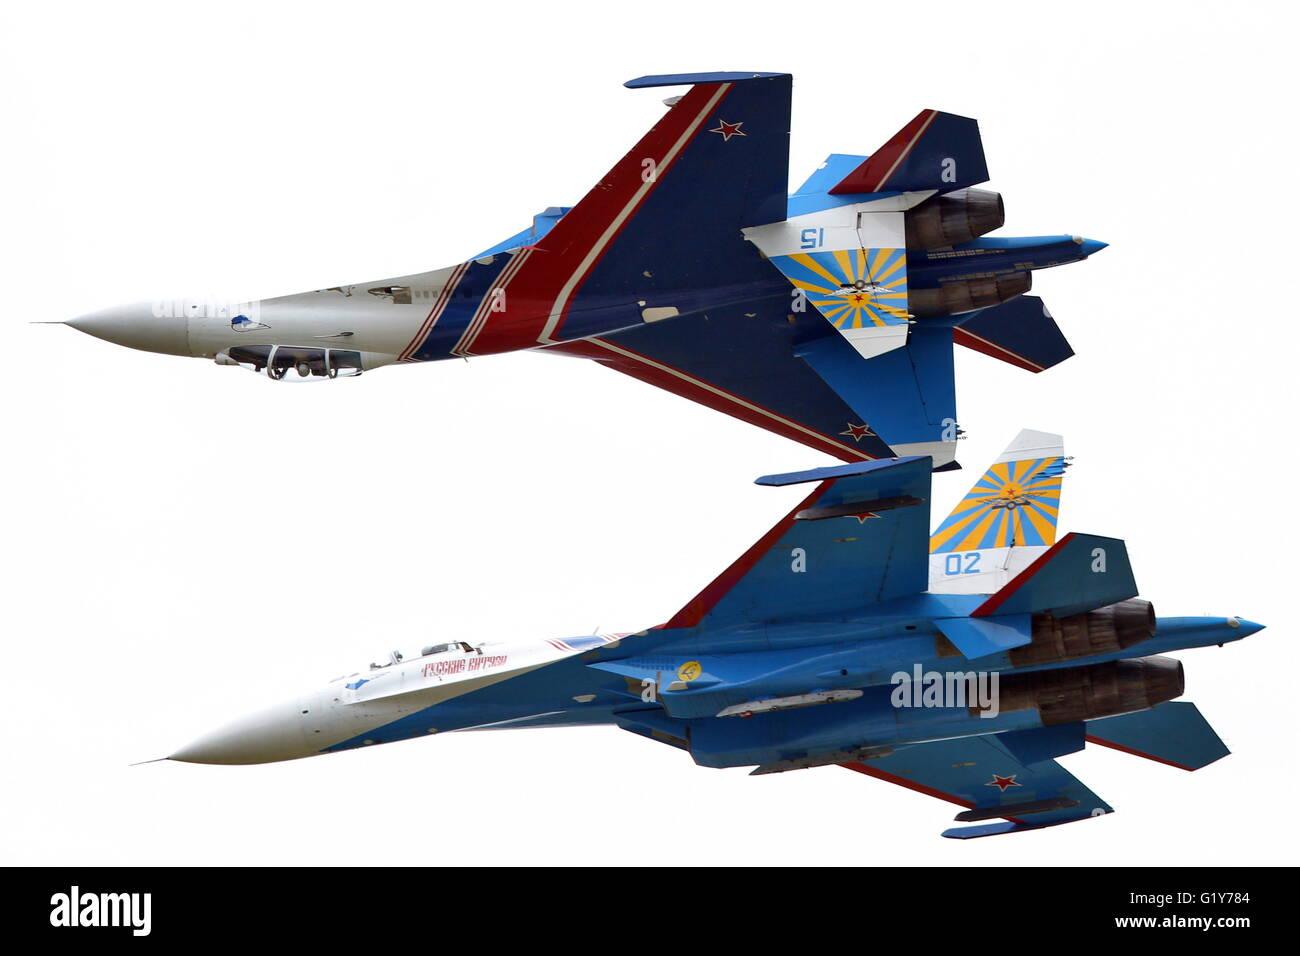 Moscow, Russia. 21st May, 2016. Sukhoi Su-27 fighter jets of the Russkiye Vityazi [Russian Knights] aerobatic team - Stock Image